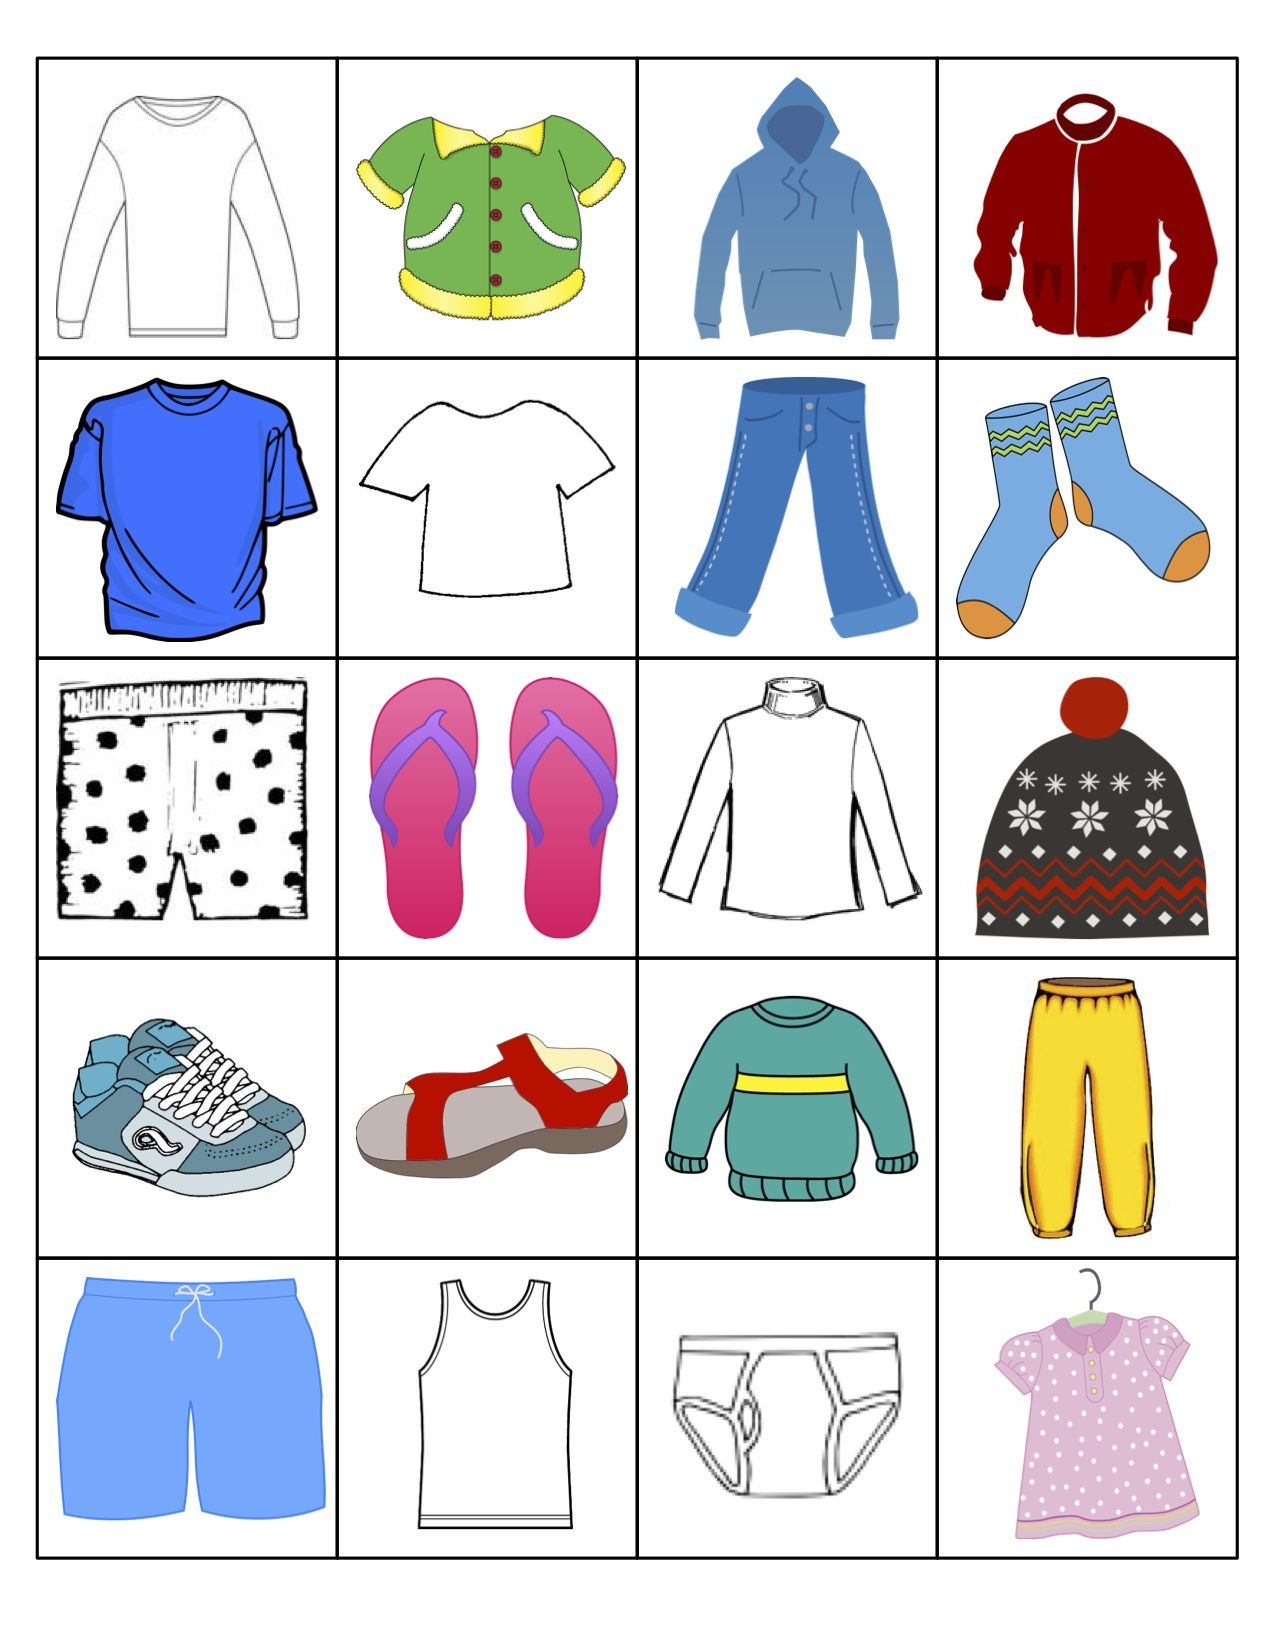 Long Sleeve Coat Hoojacket T Shirt Under Shirt Jeans Socks Boxers Flipflops